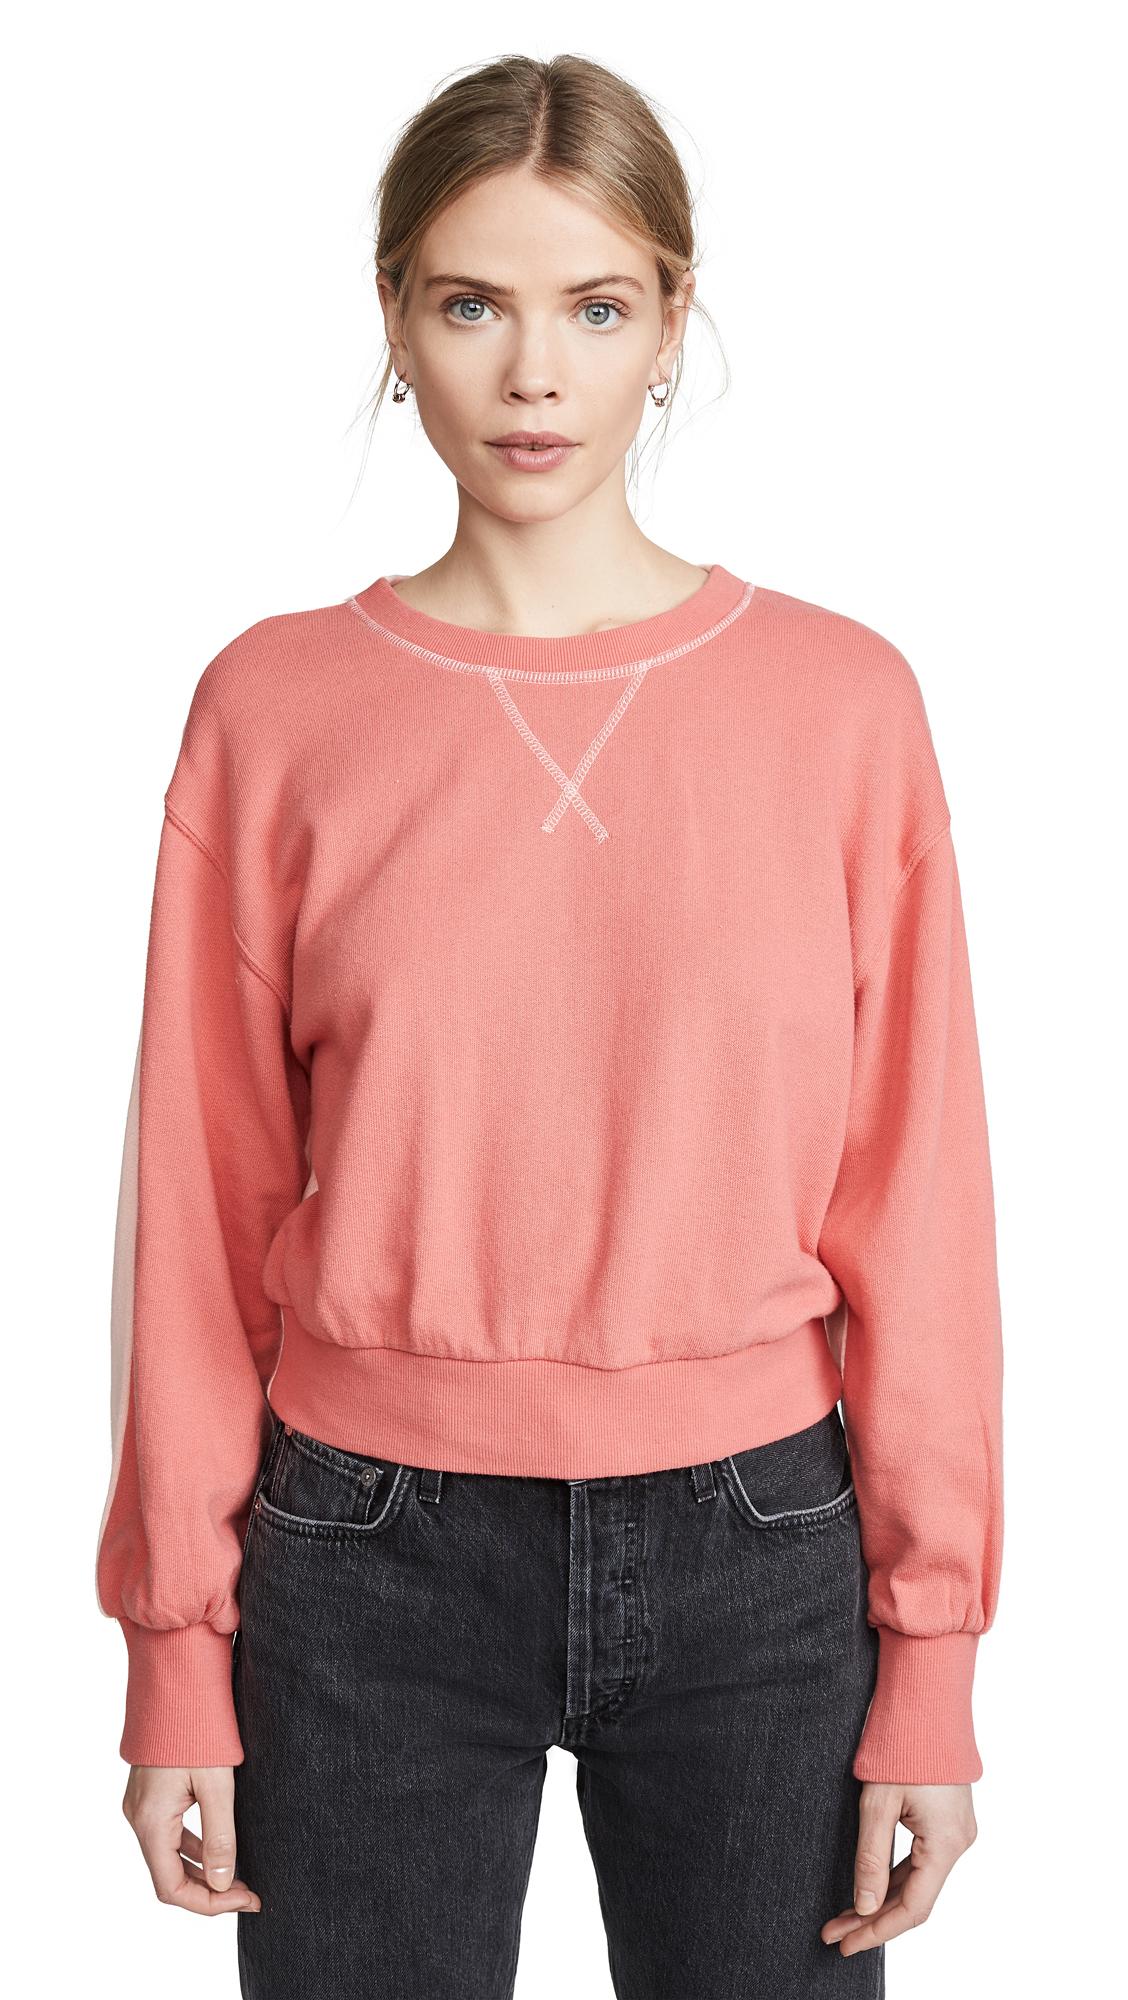 Splendid Ryder Active Crew Sweatshirt - Carmine/Fresh Pink